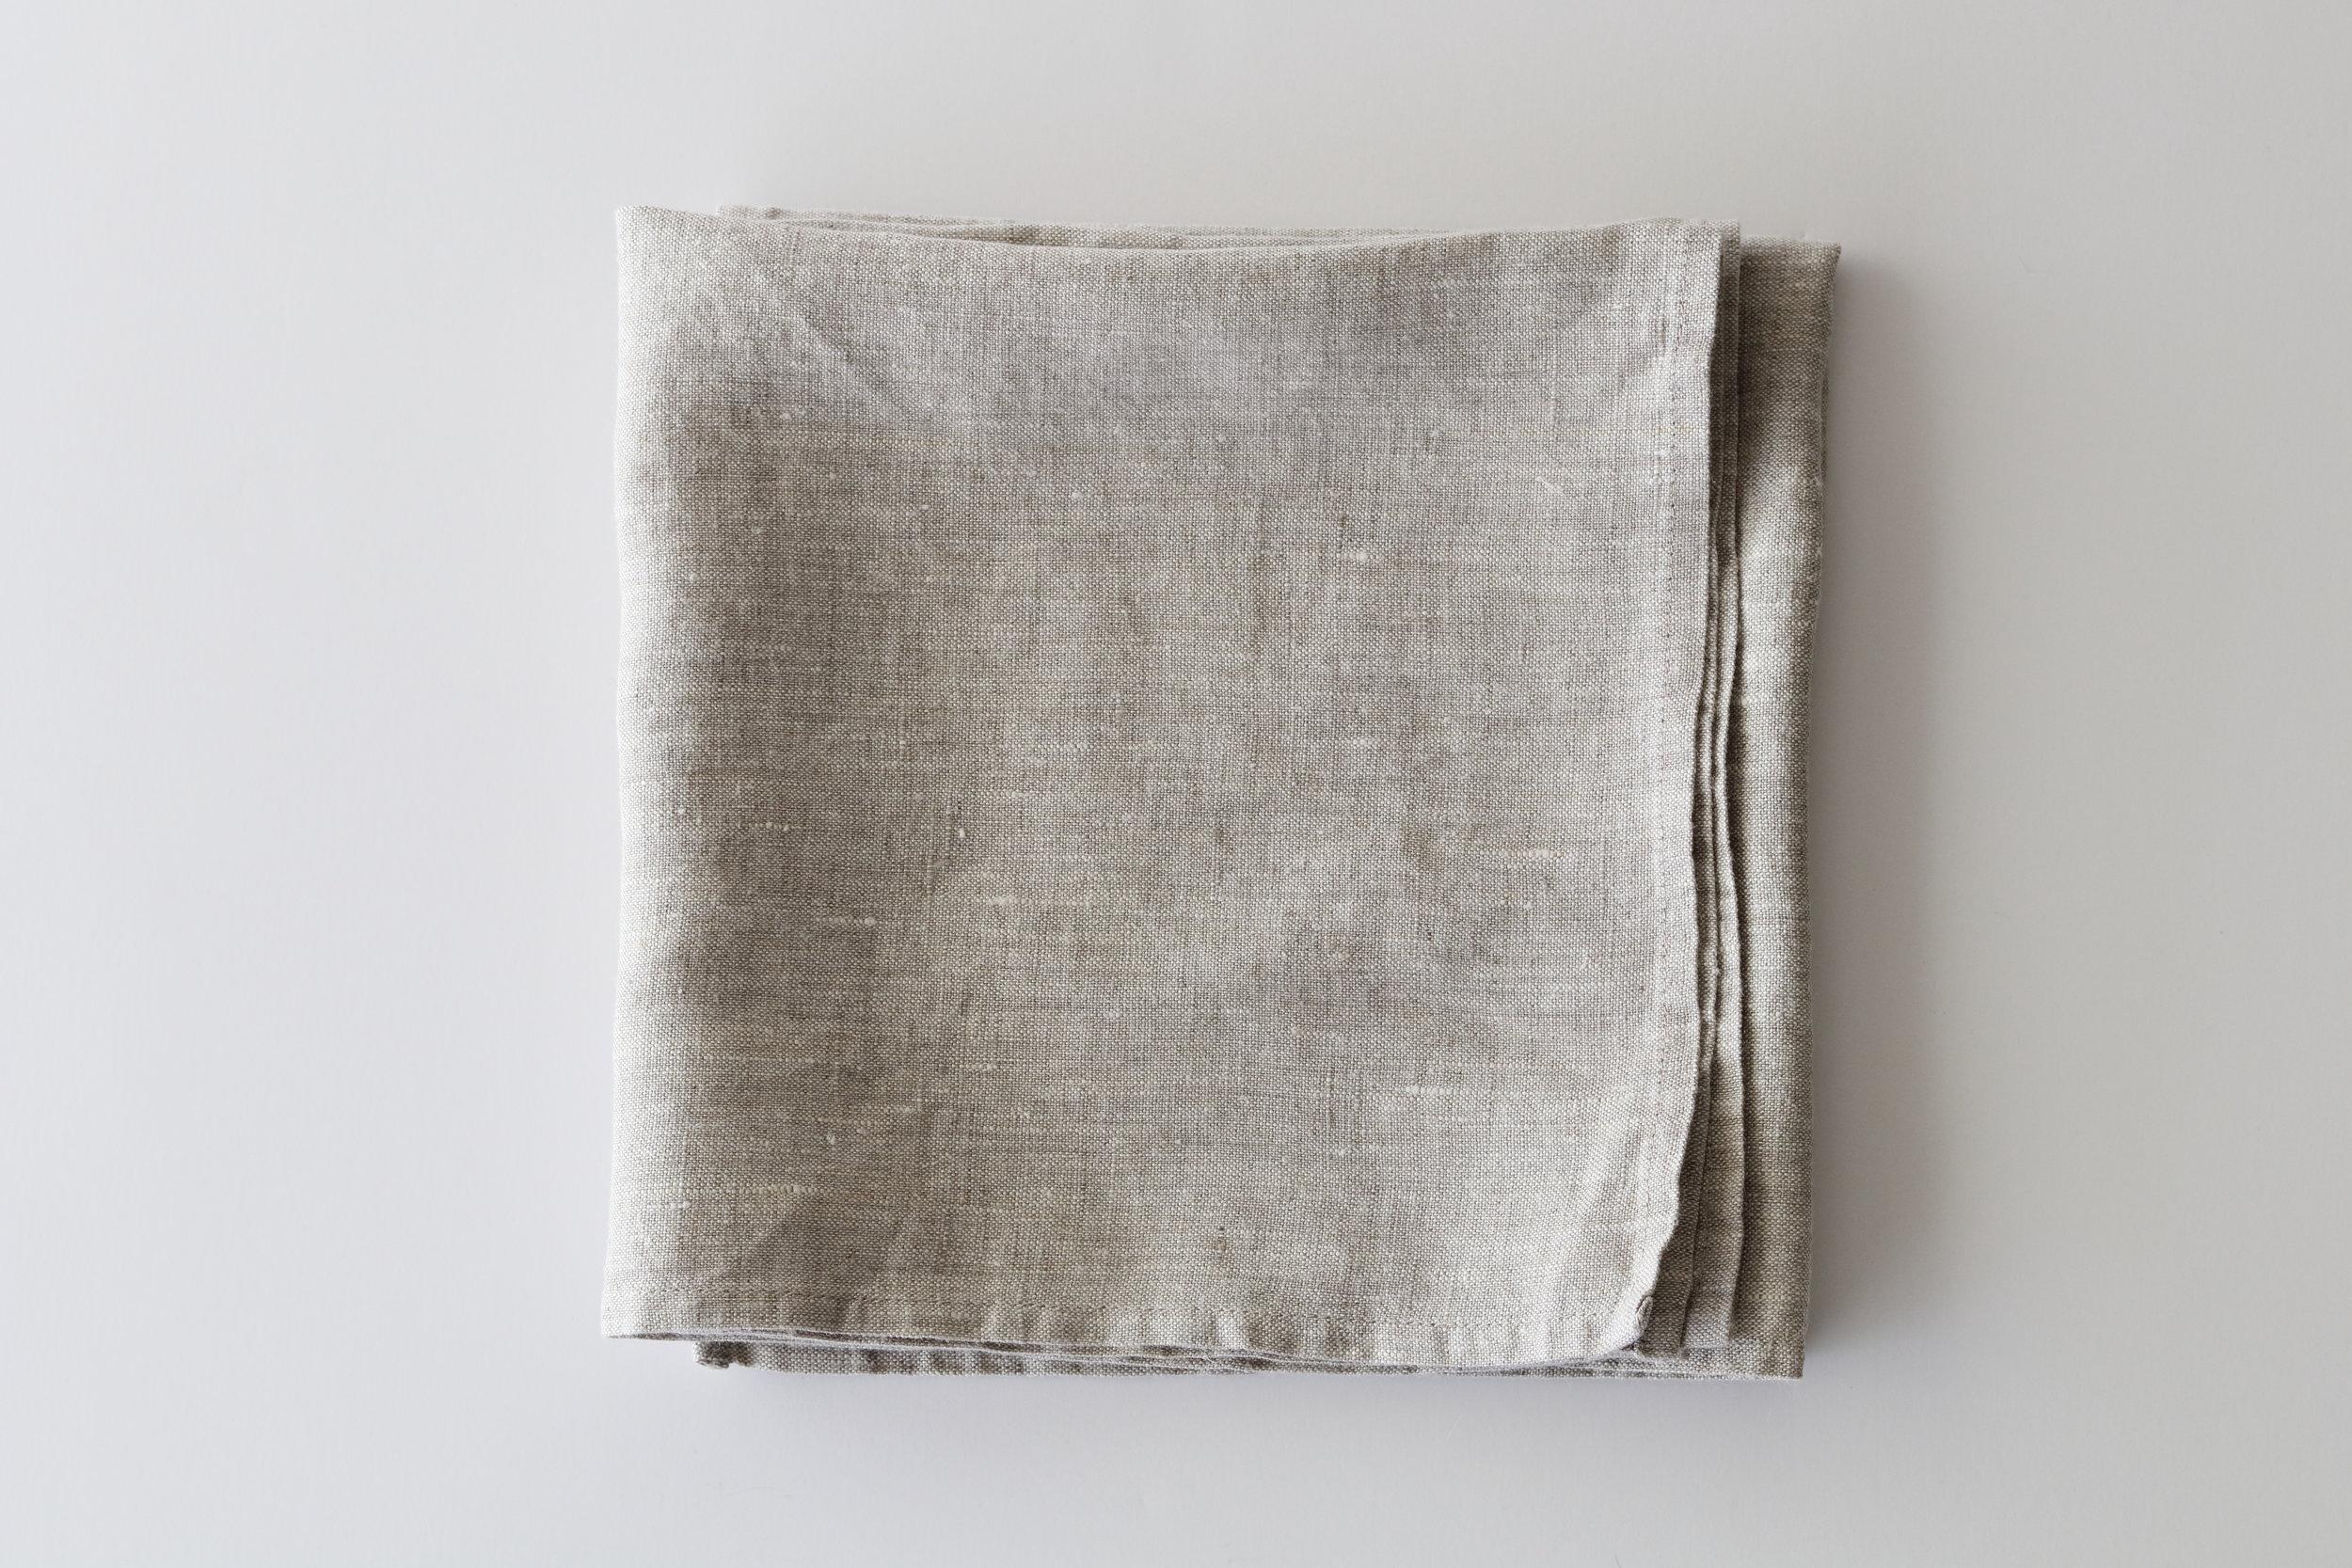 Heather Gray Linen Napkins Set Of 4 Or 6 Fold